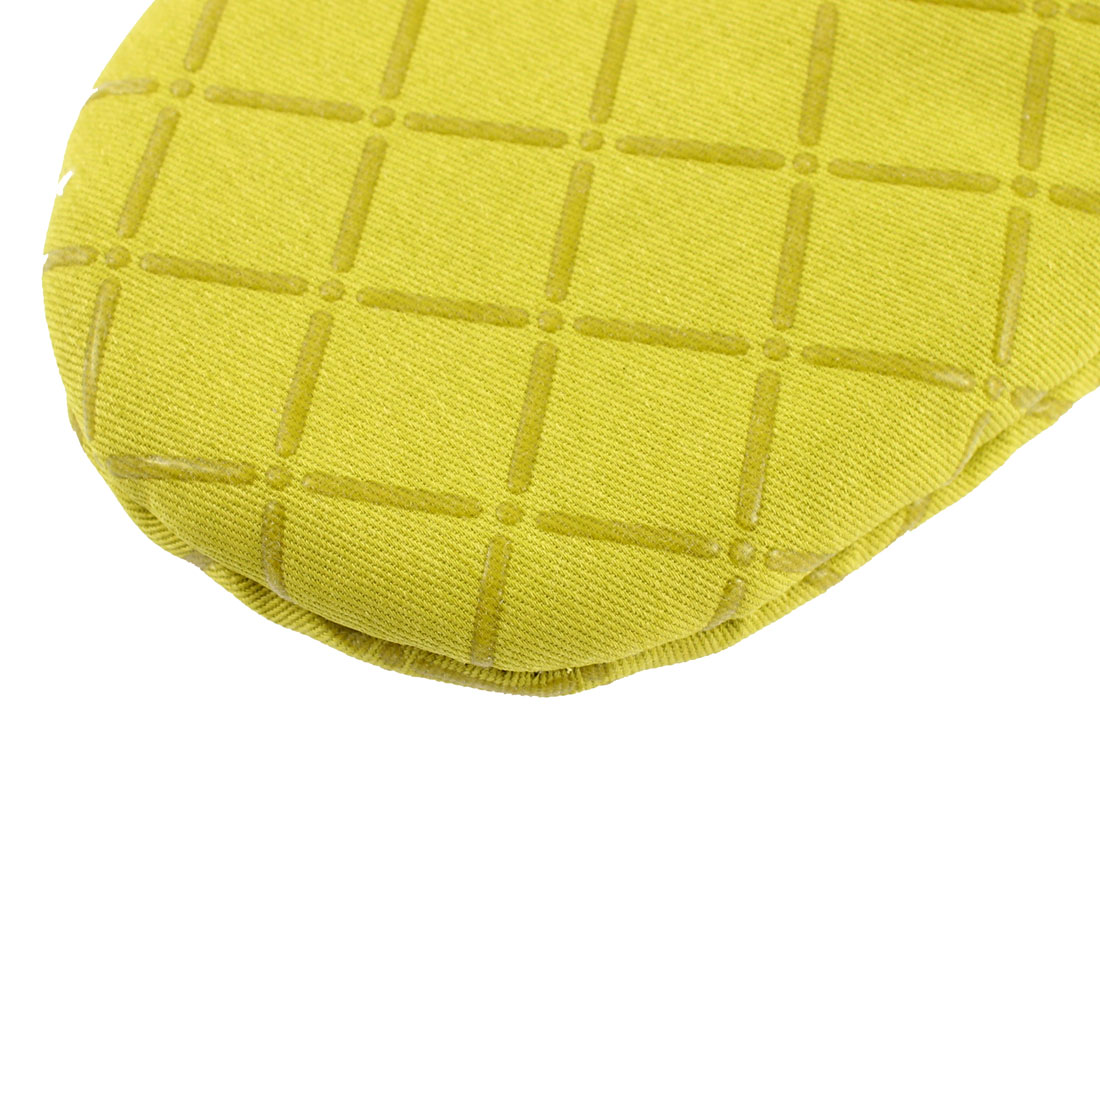 Kitchen Microwave Baking Cross Pattern Heat Resistance Mitten Glove Green - image 1 of 3